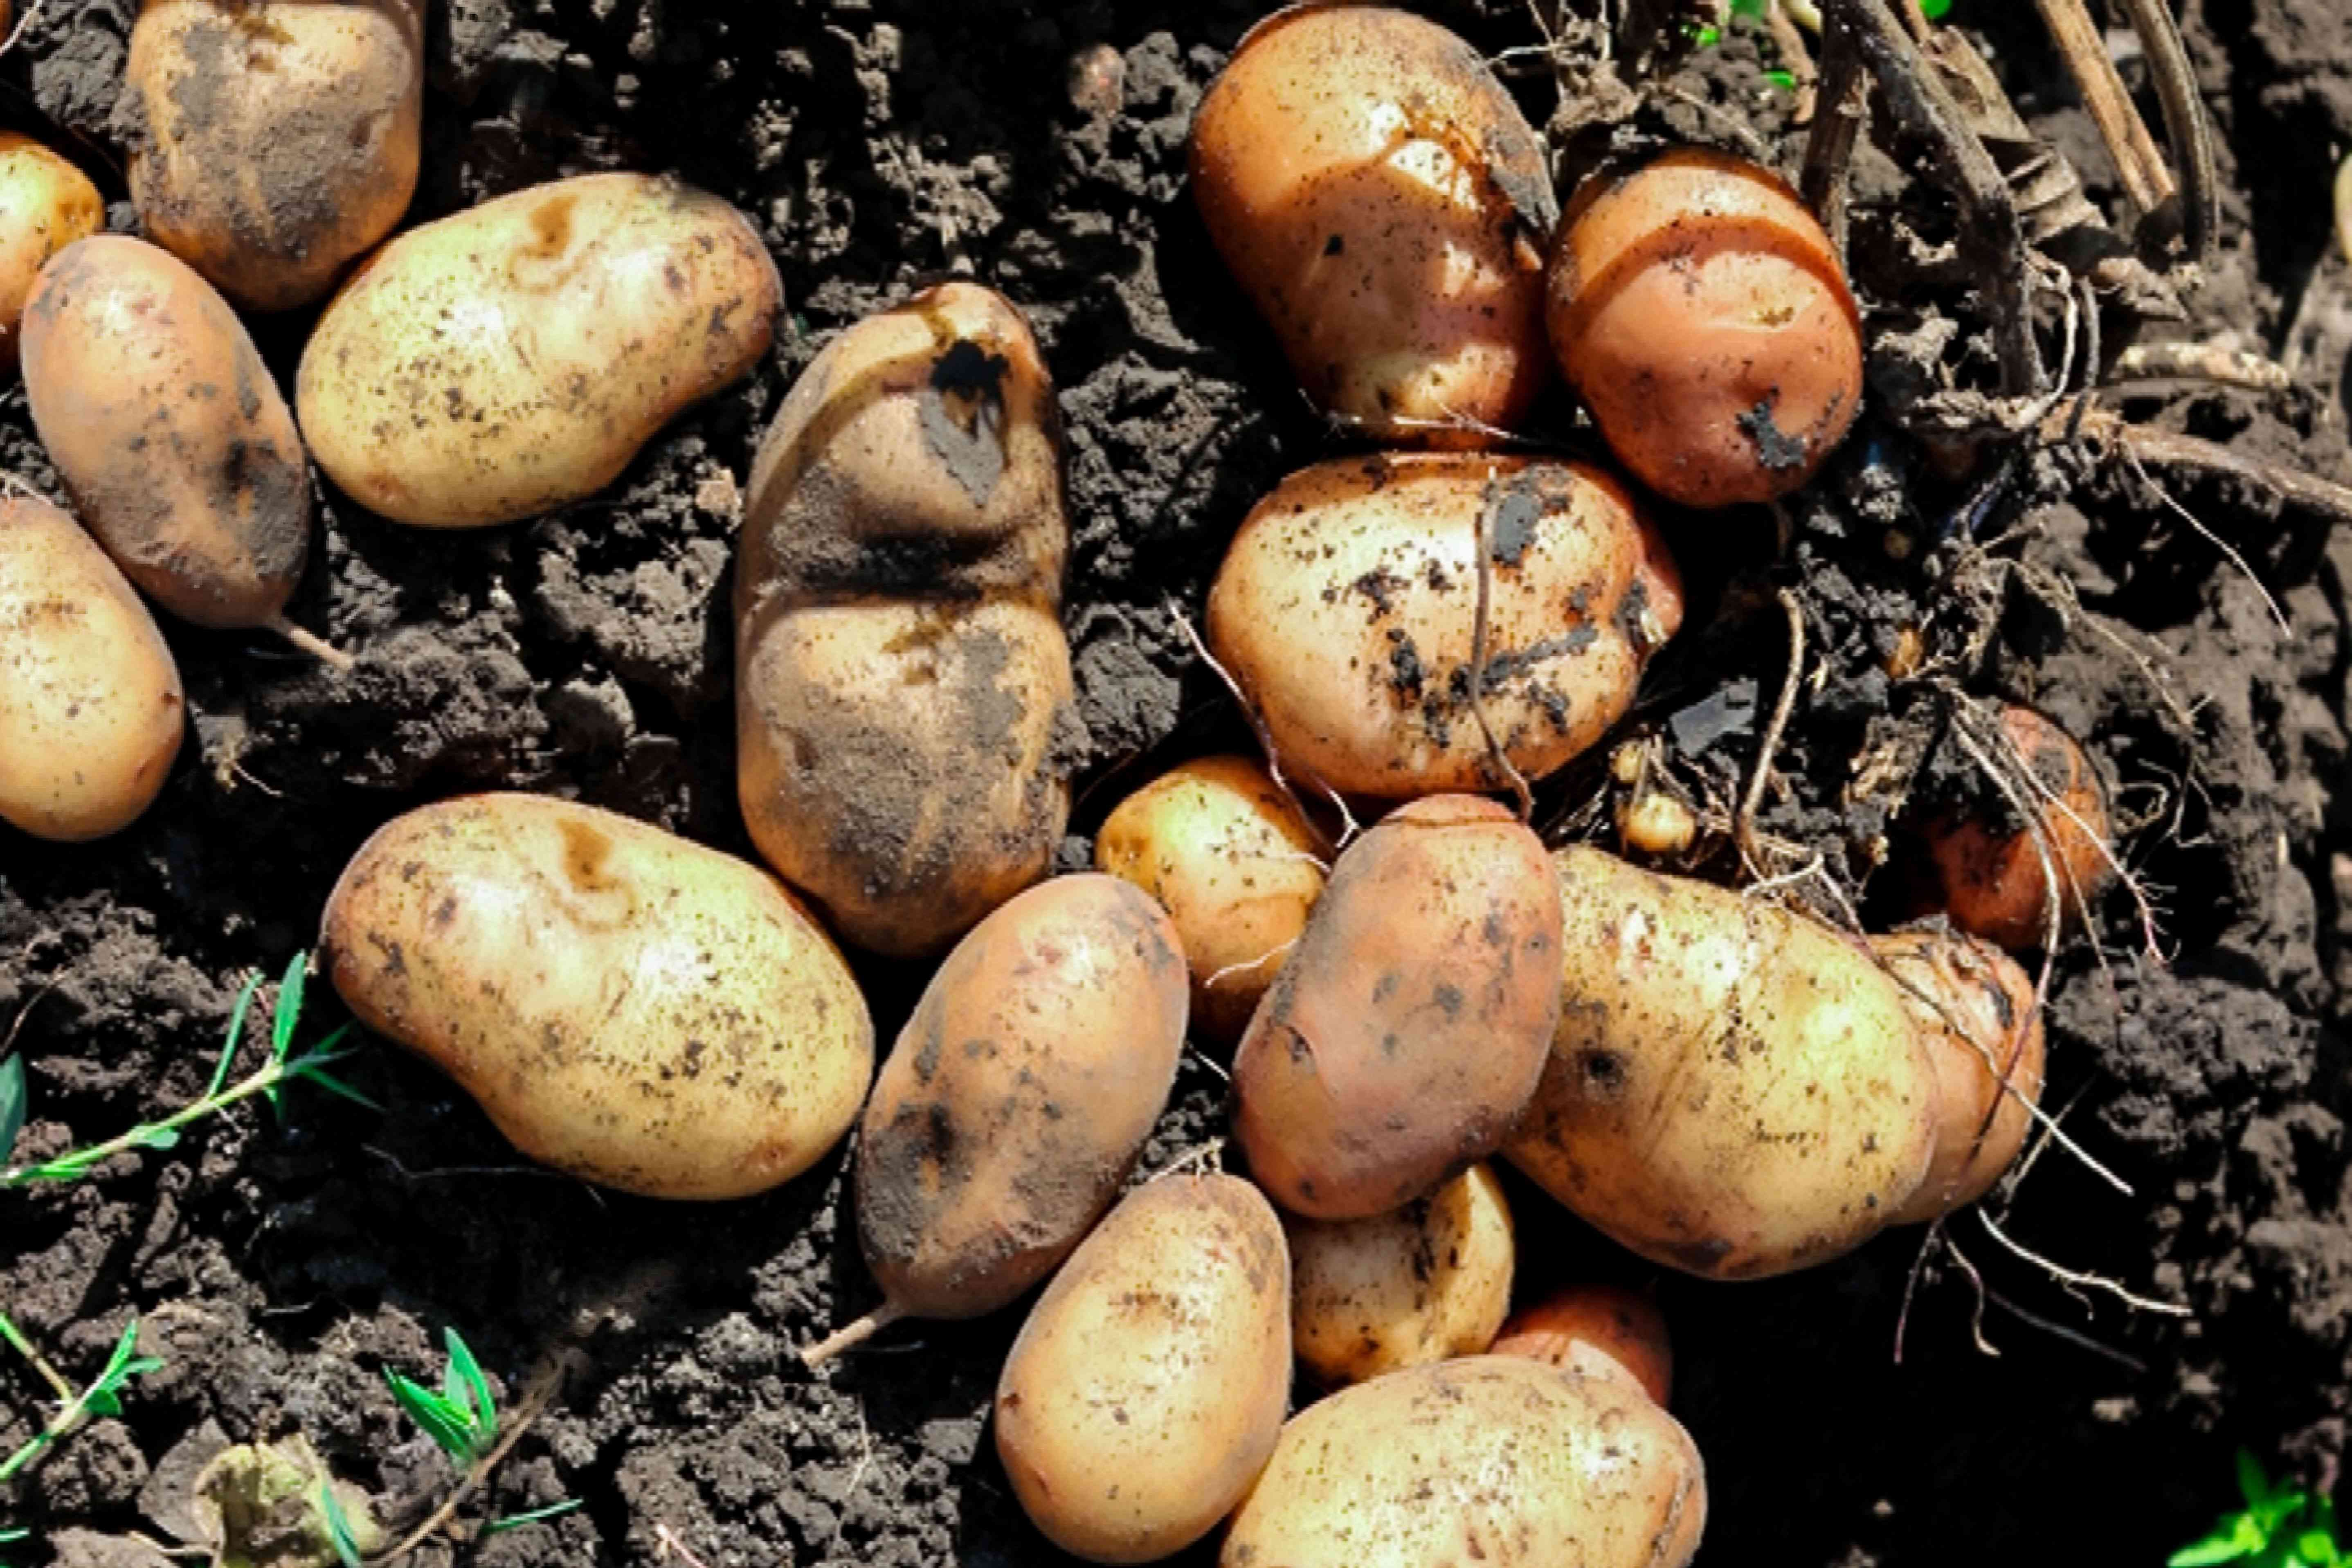 Potatoes covered in soil in sunlight closeup